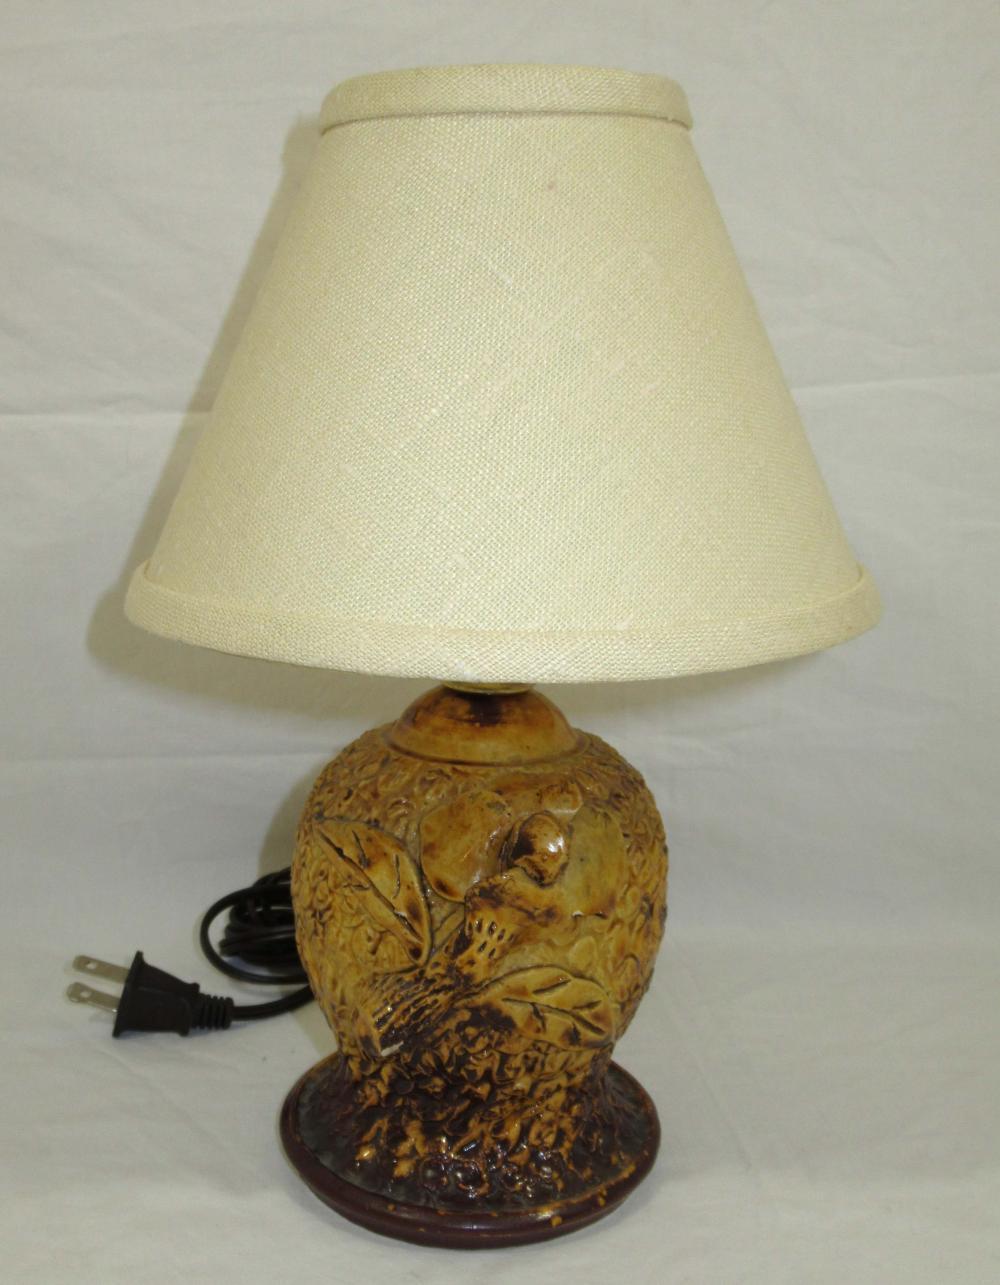 Evans Pottery Lamp